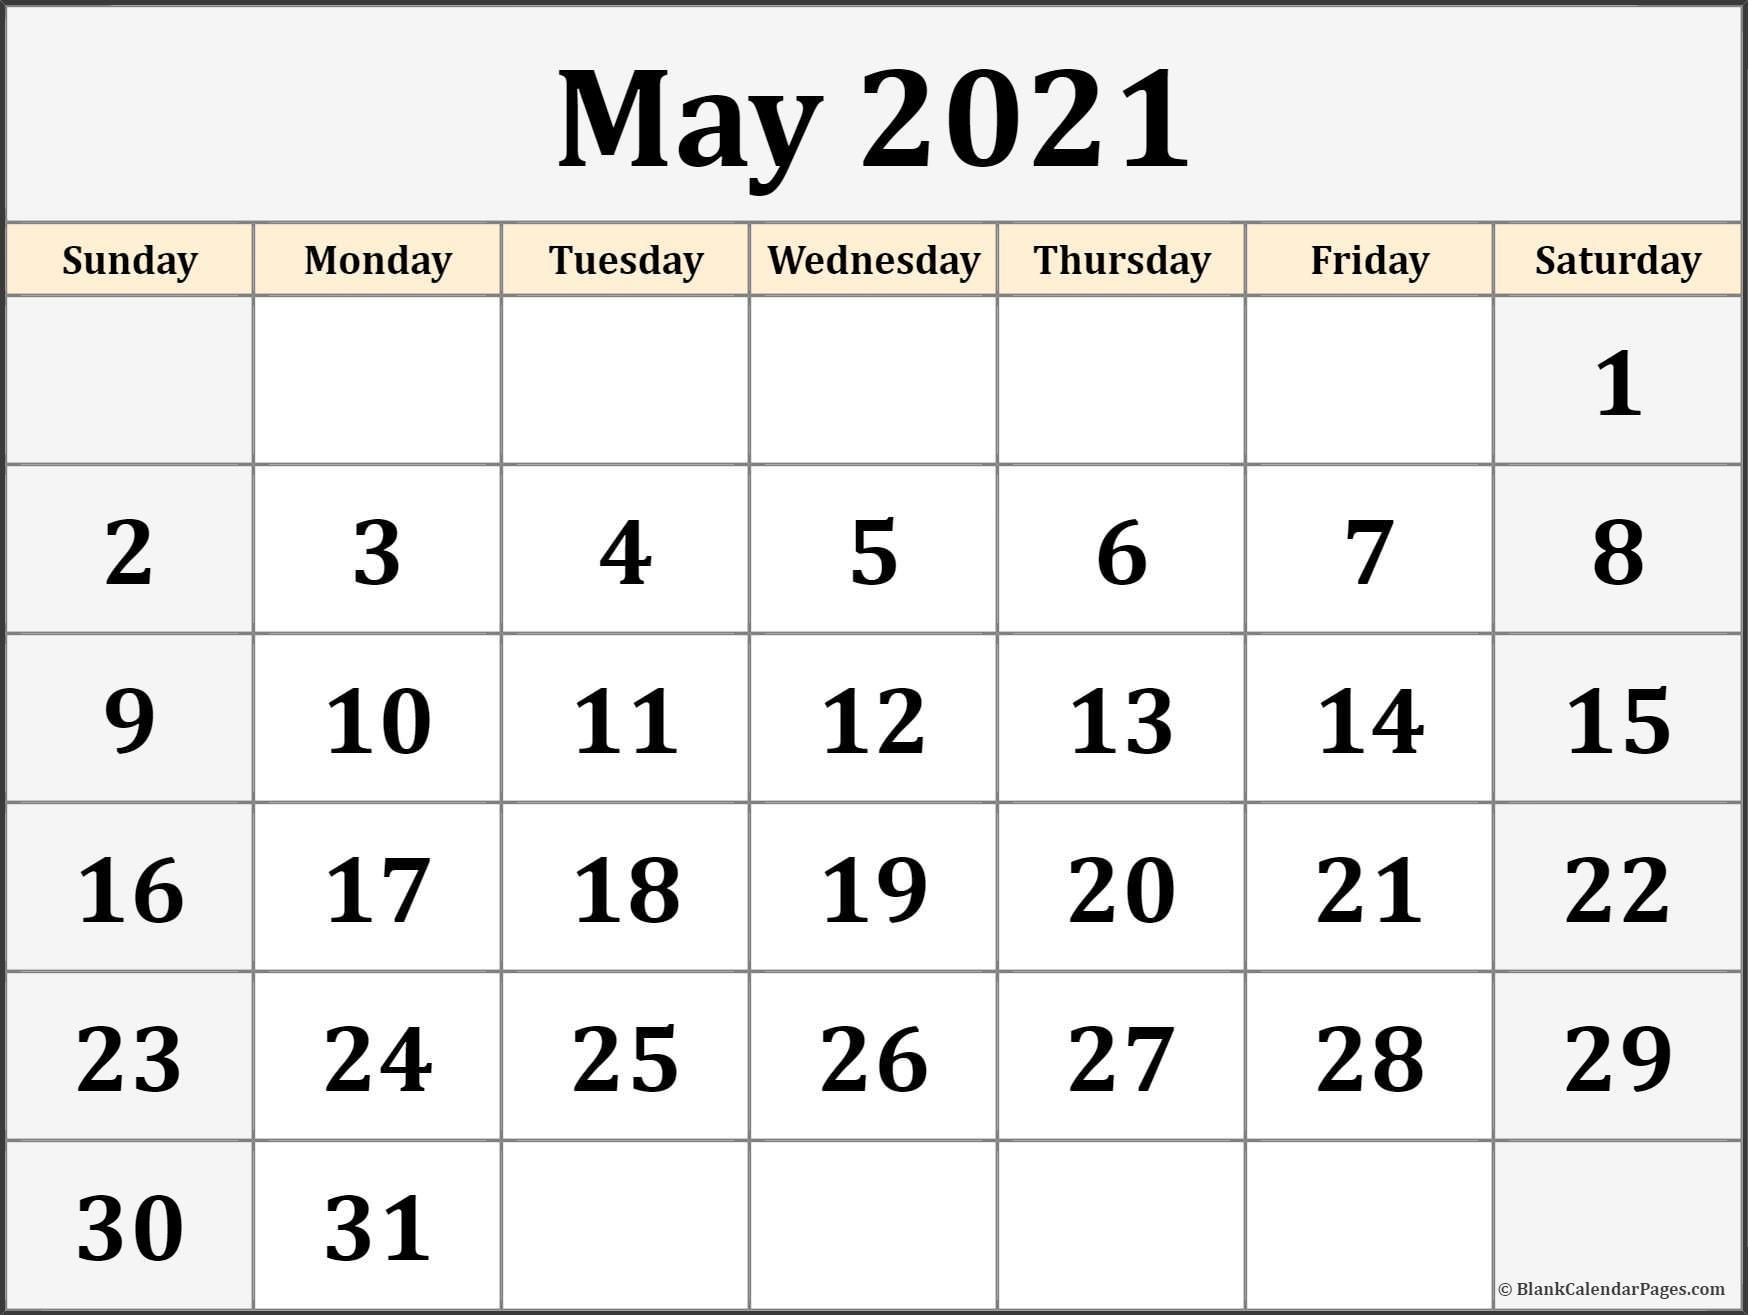 May 2021 Blank Calendar Templates.  Free Blank Printable Monthly Calendar 2021